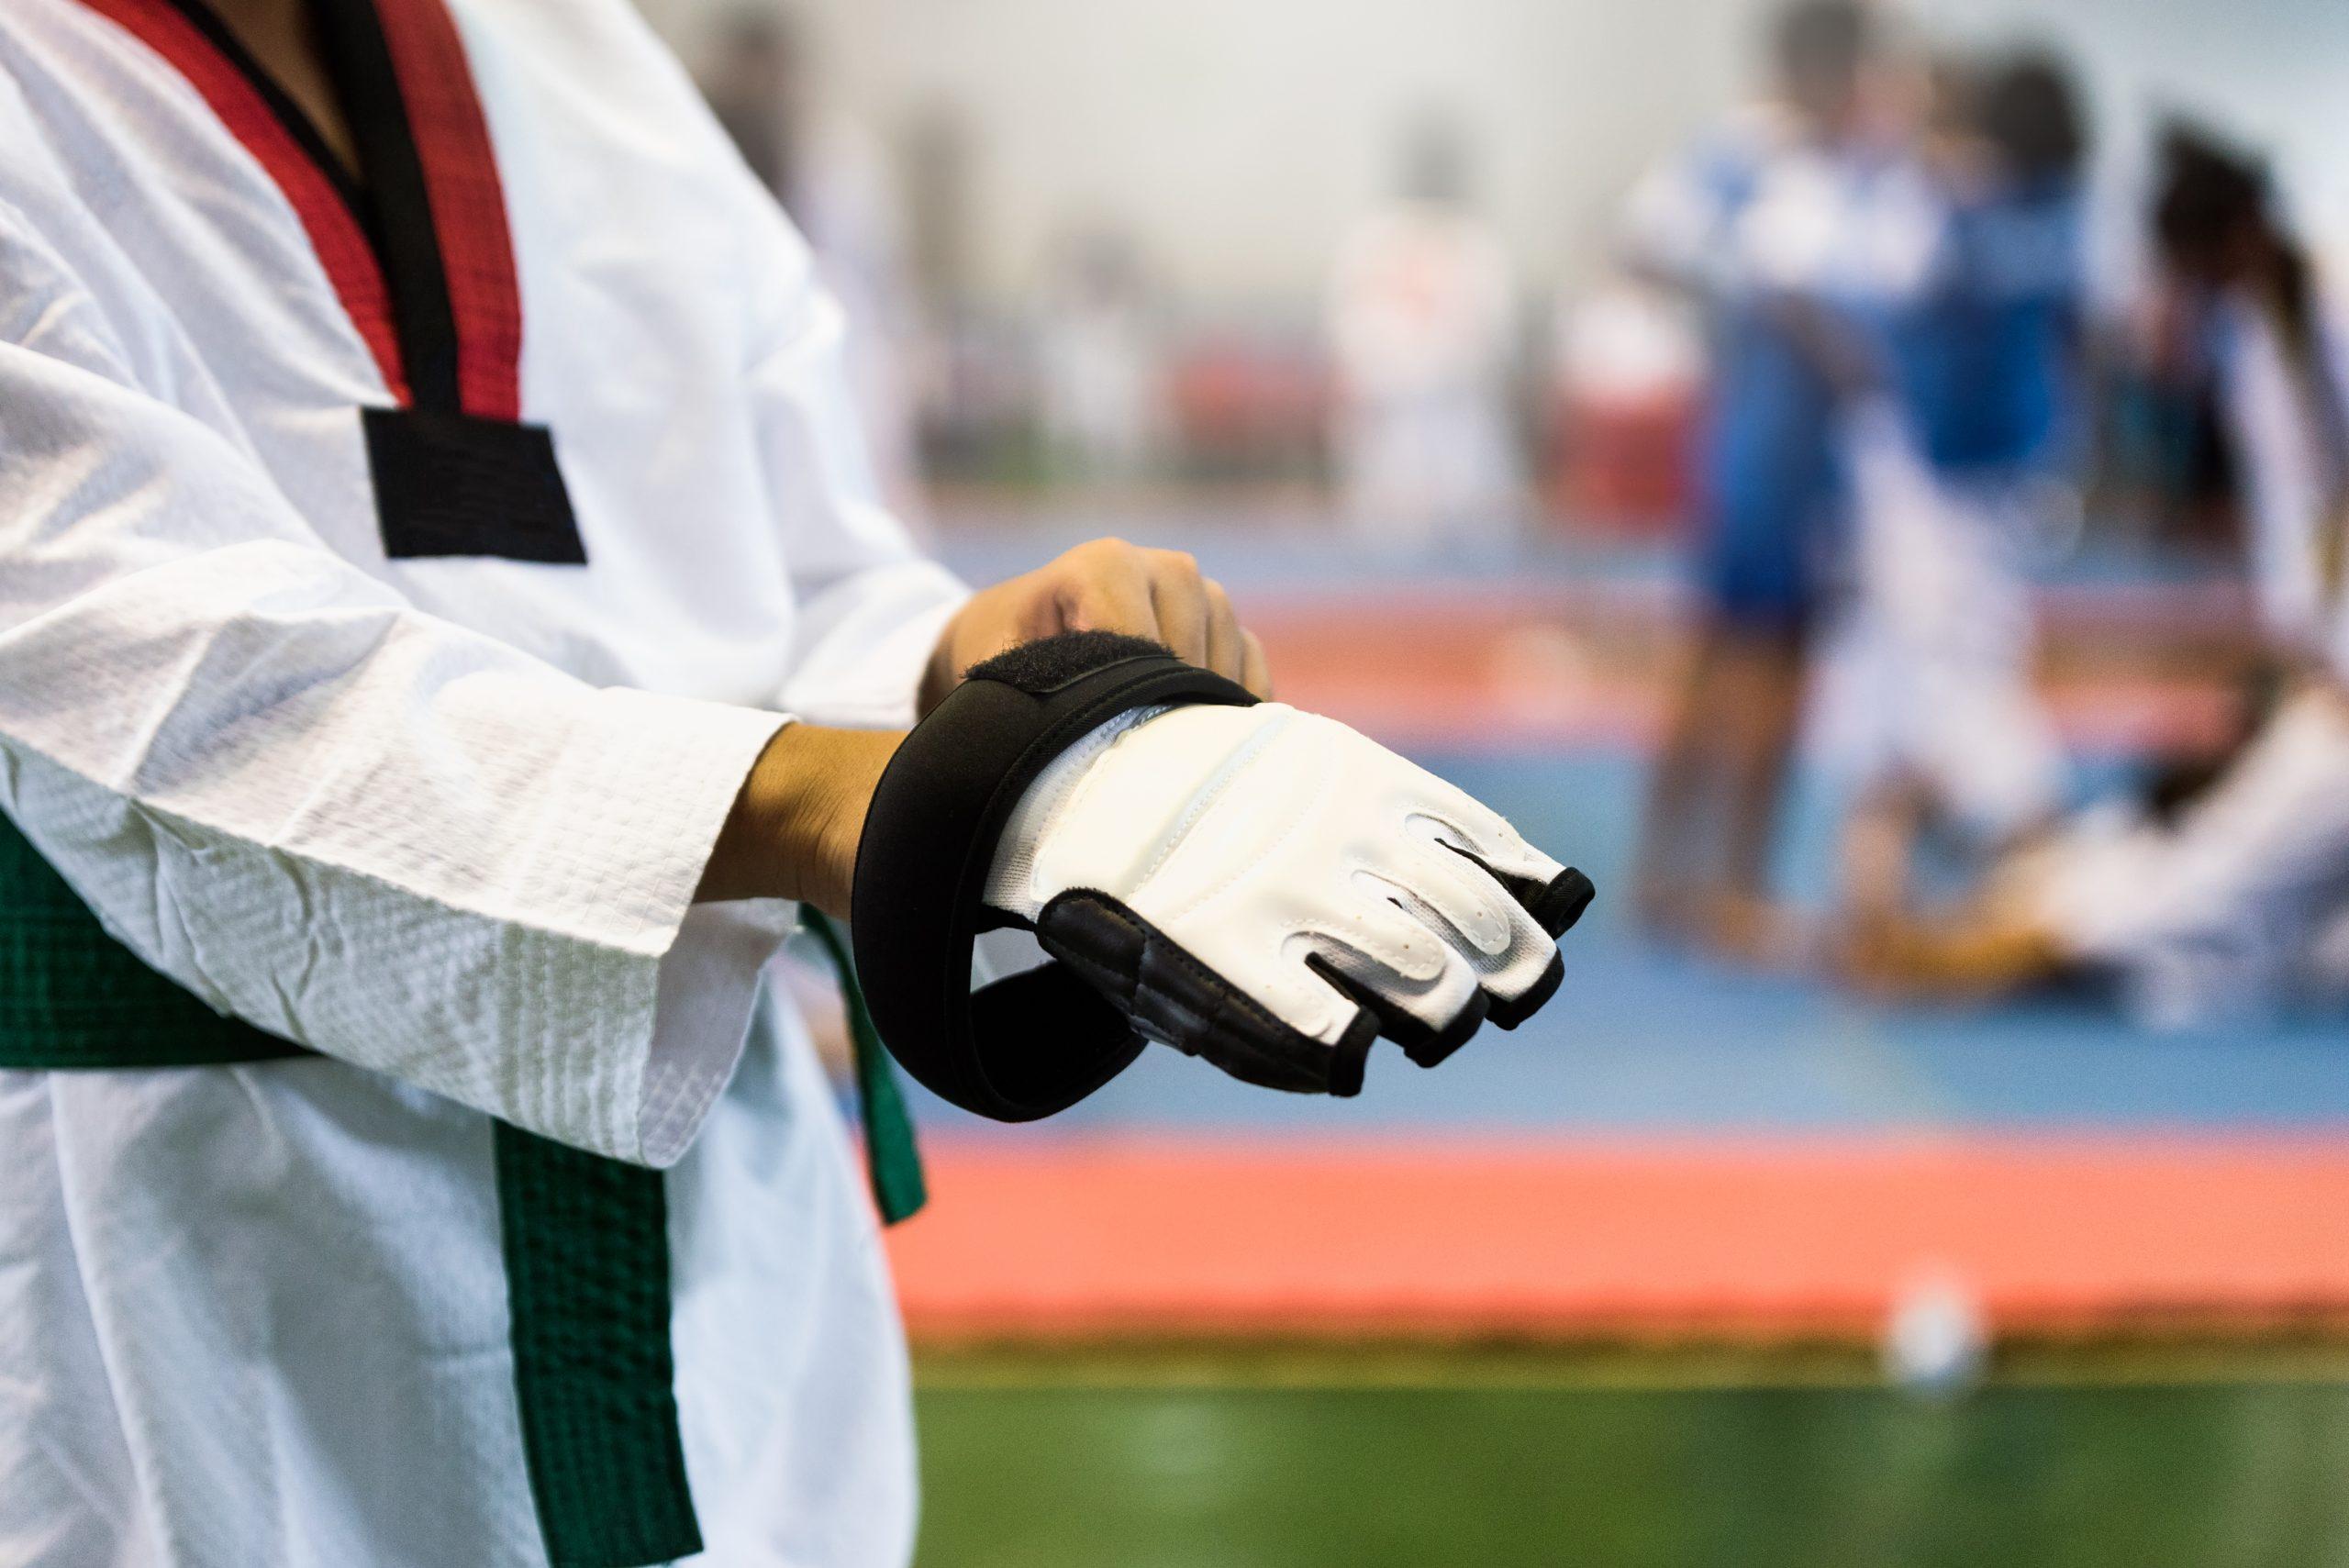 Taekwondo Classes